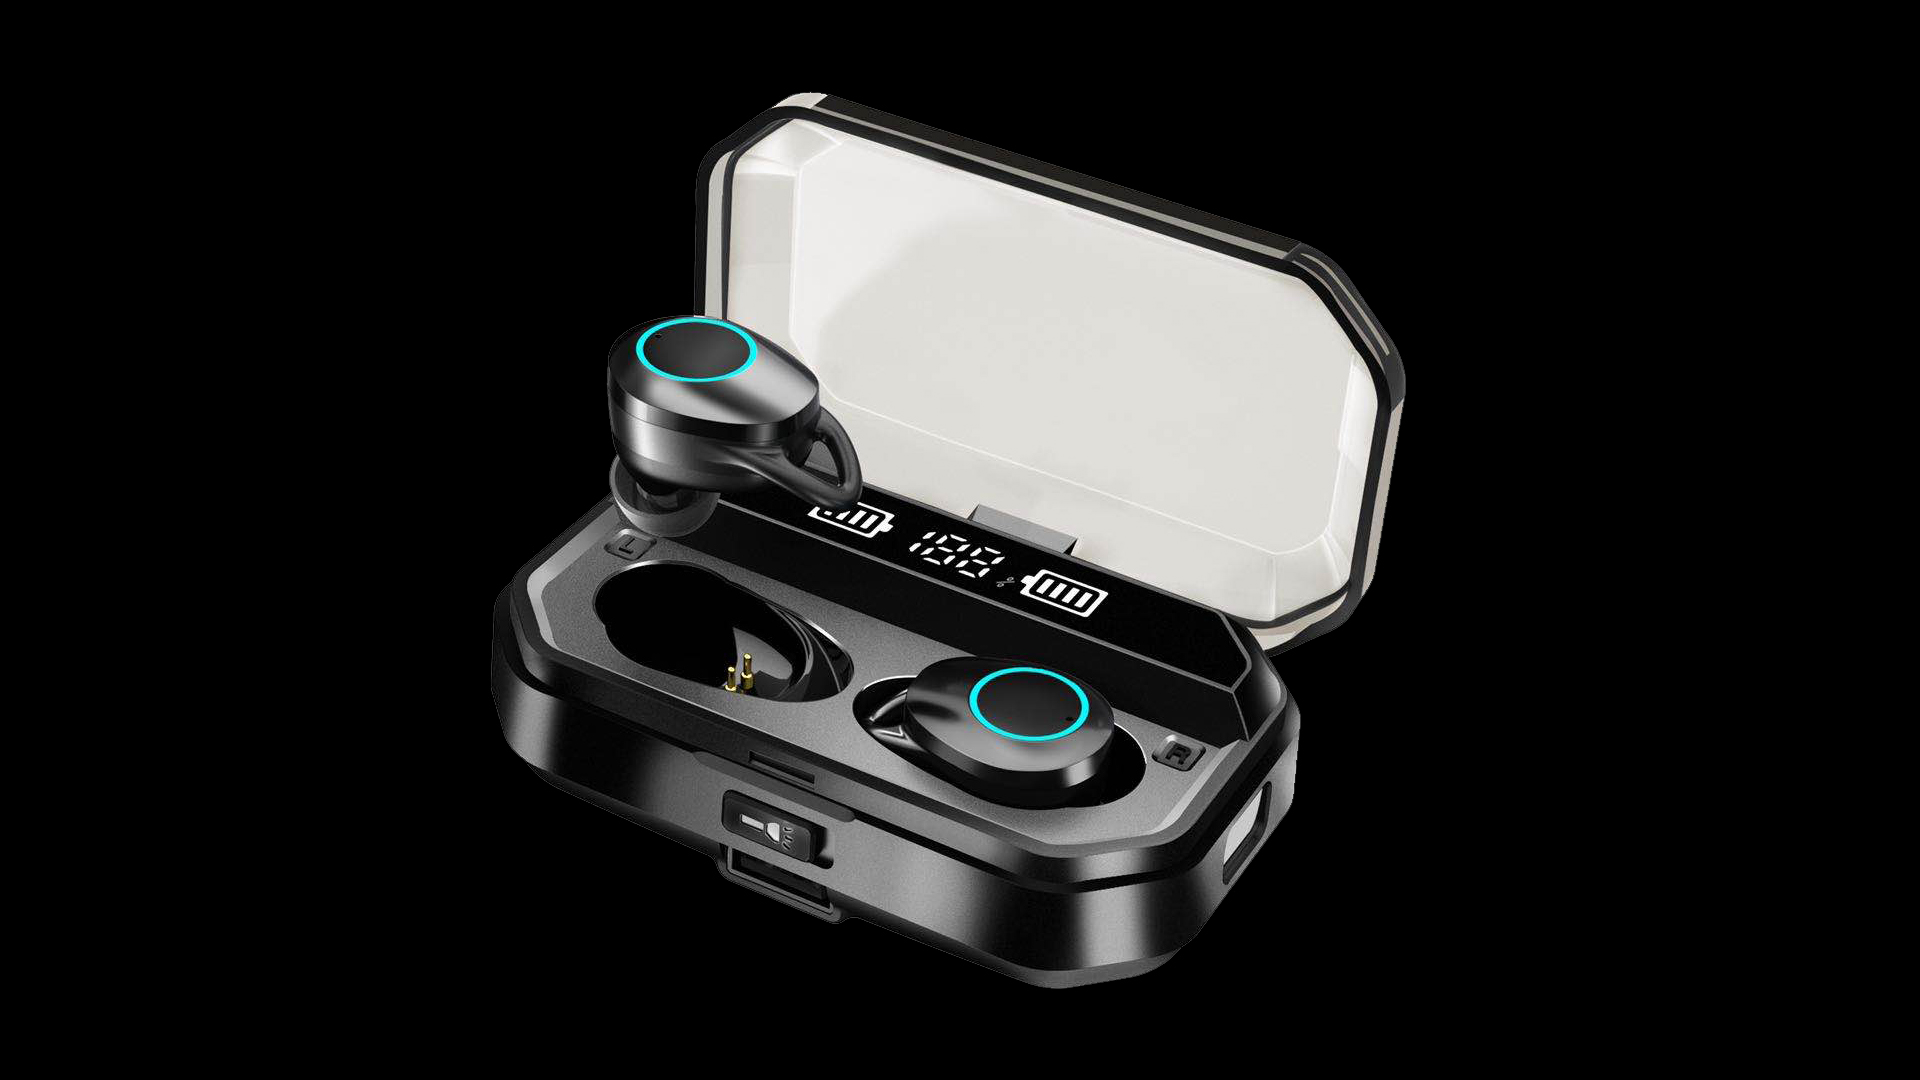 Benutzerdefinierte Gaming Headset MI Air Tube Wireless Handfree Power Bank Funktion Zahn Kopfhörer Stereo Ohrhörer Ohr Telefon T19